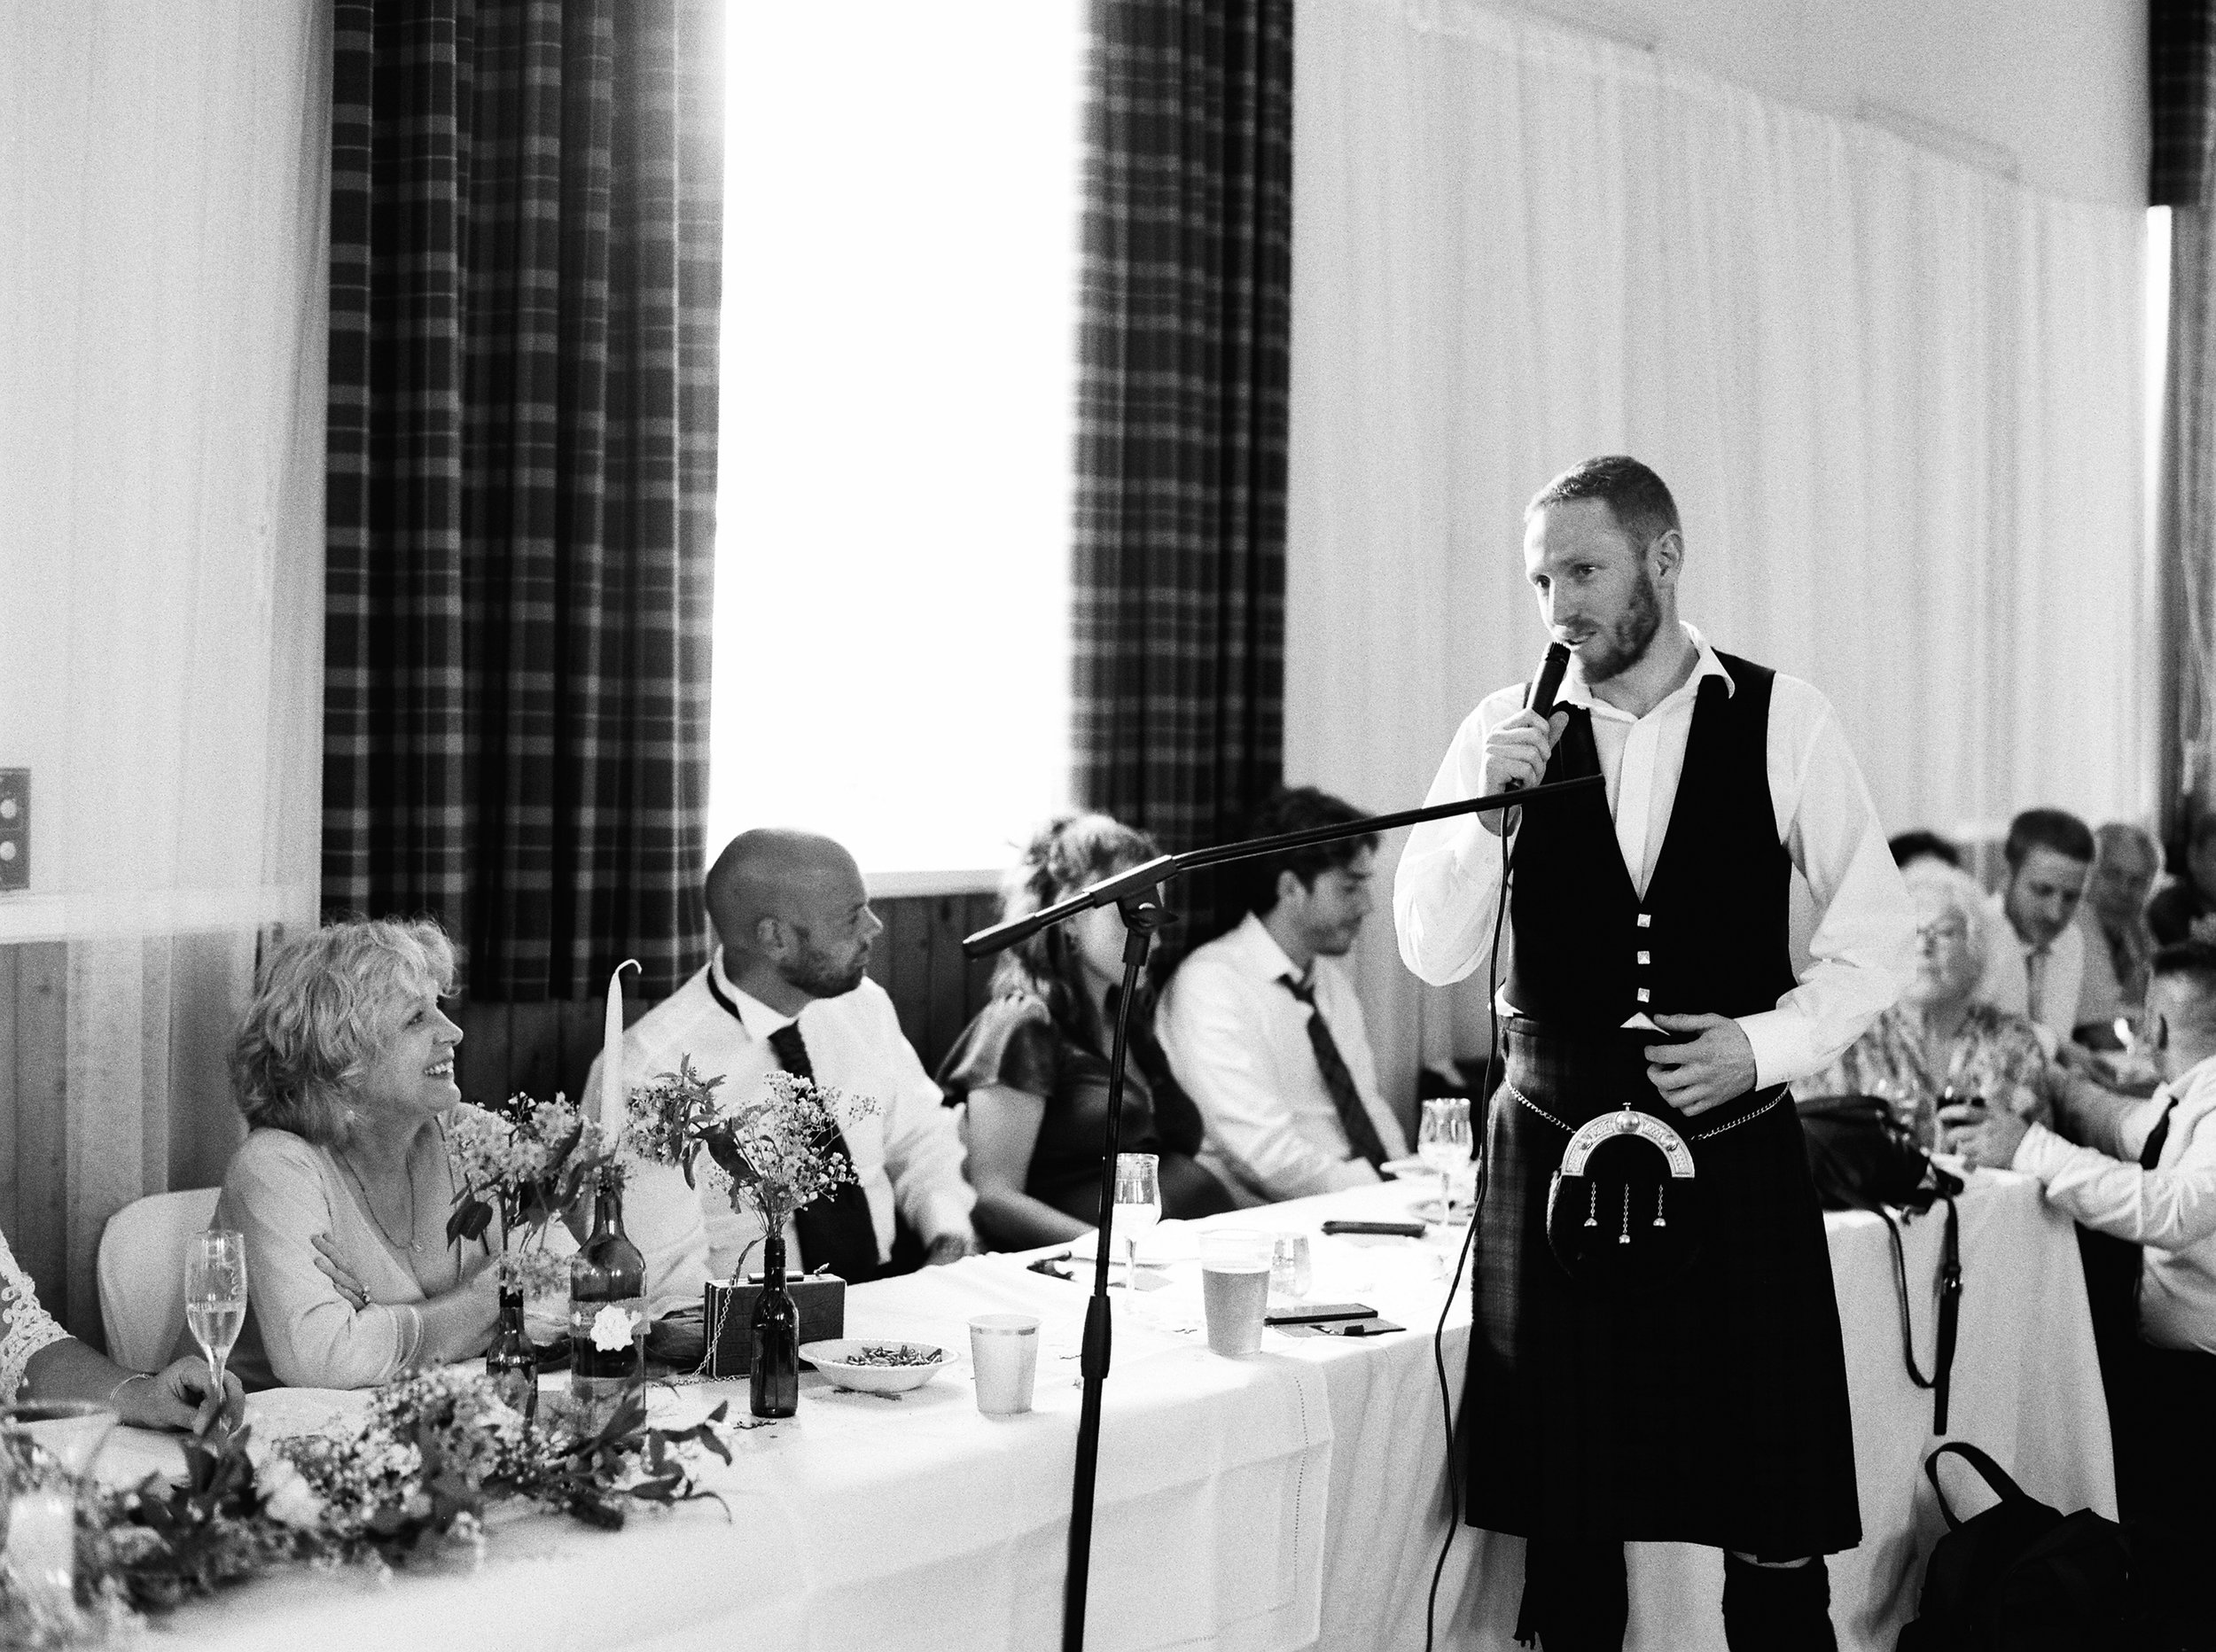 wedding-photography-scotland188.jpg